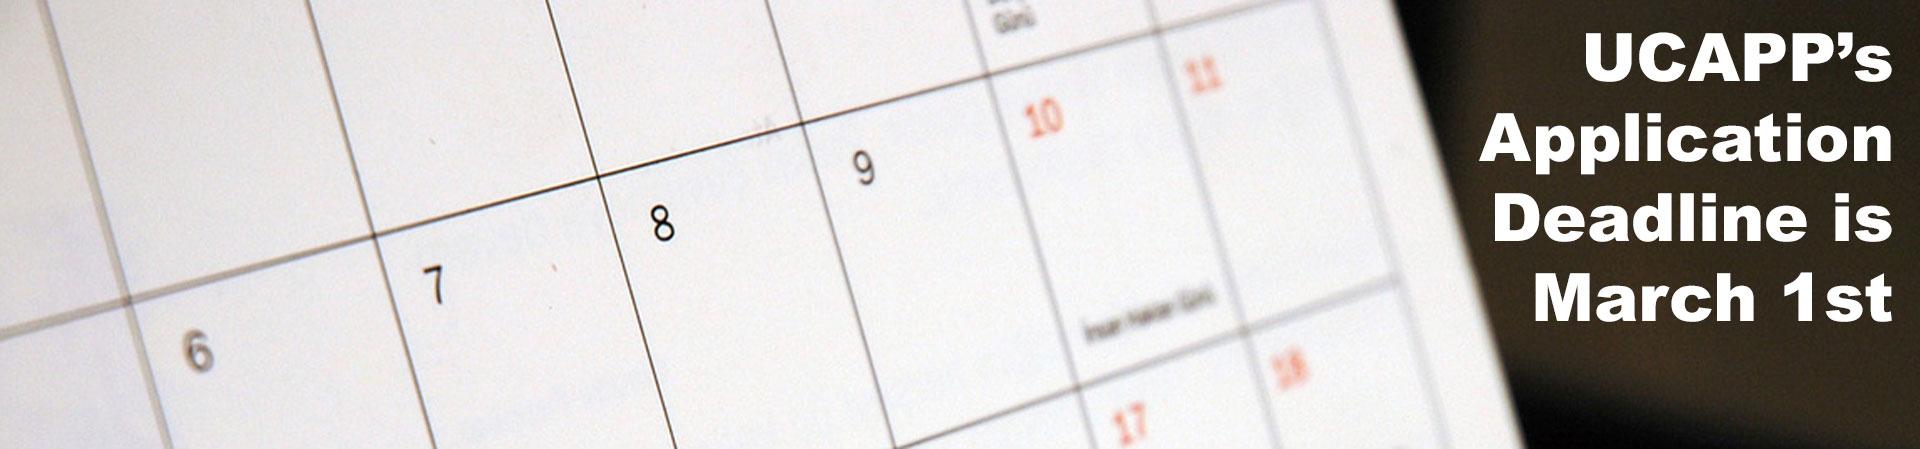 Calendar indicating UCAPP's March 1st application deadline